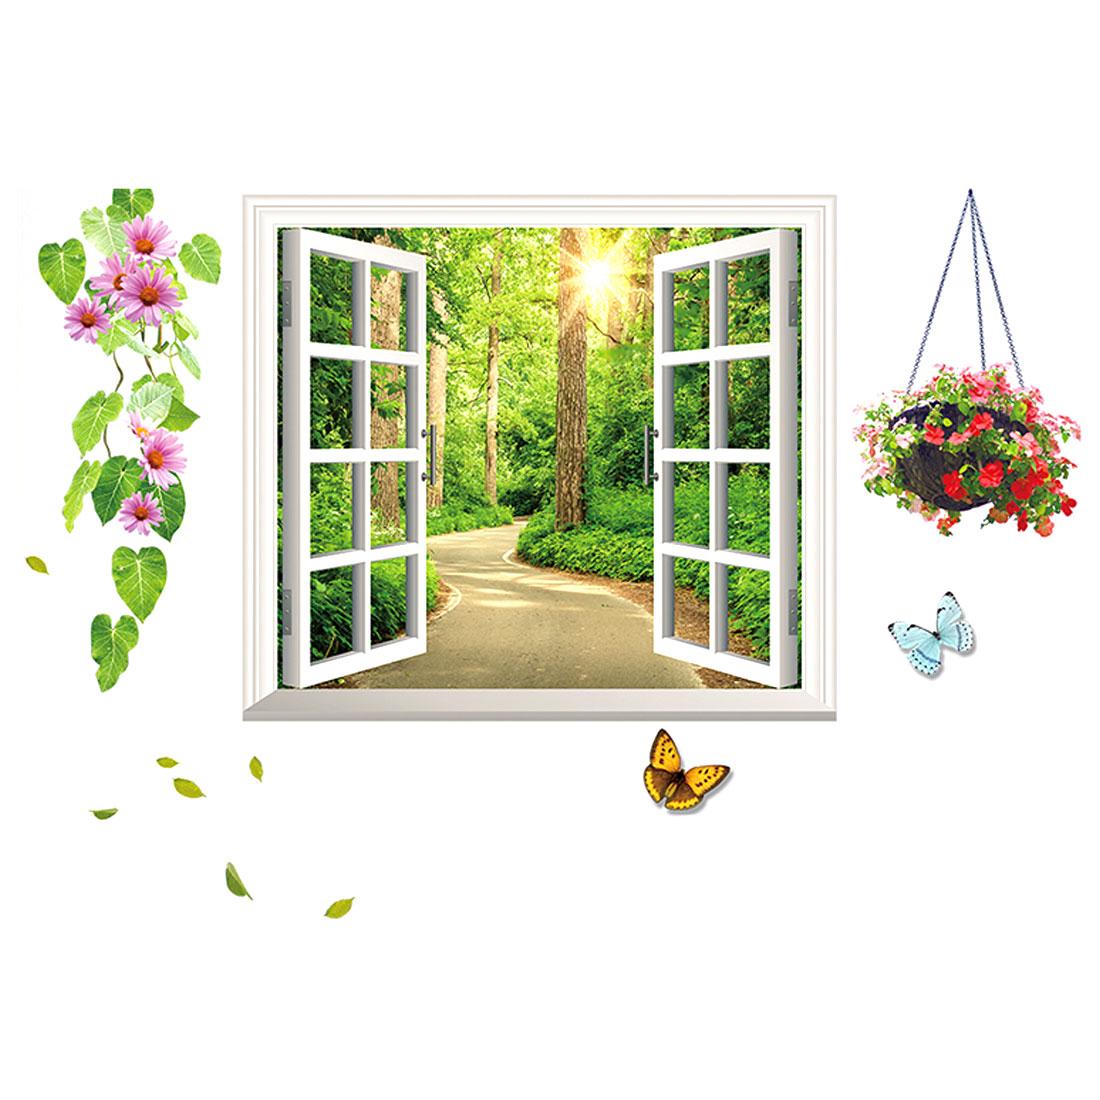 Room PVC Window Pattern DIY Self-adhesive Wall Decoration Sticker Multicolor